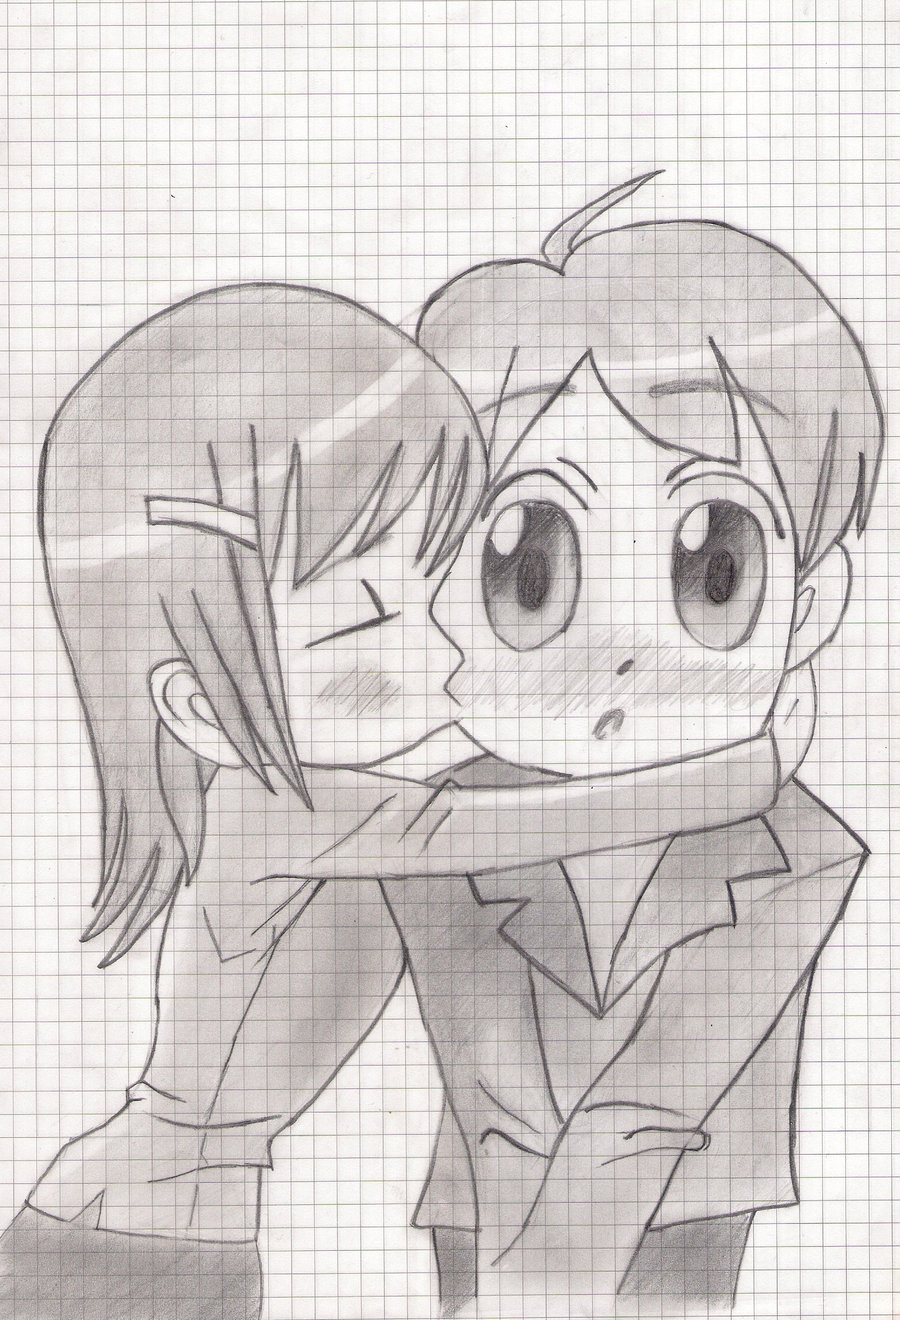 Drawn kisses chibi On by  Kiss Chibi